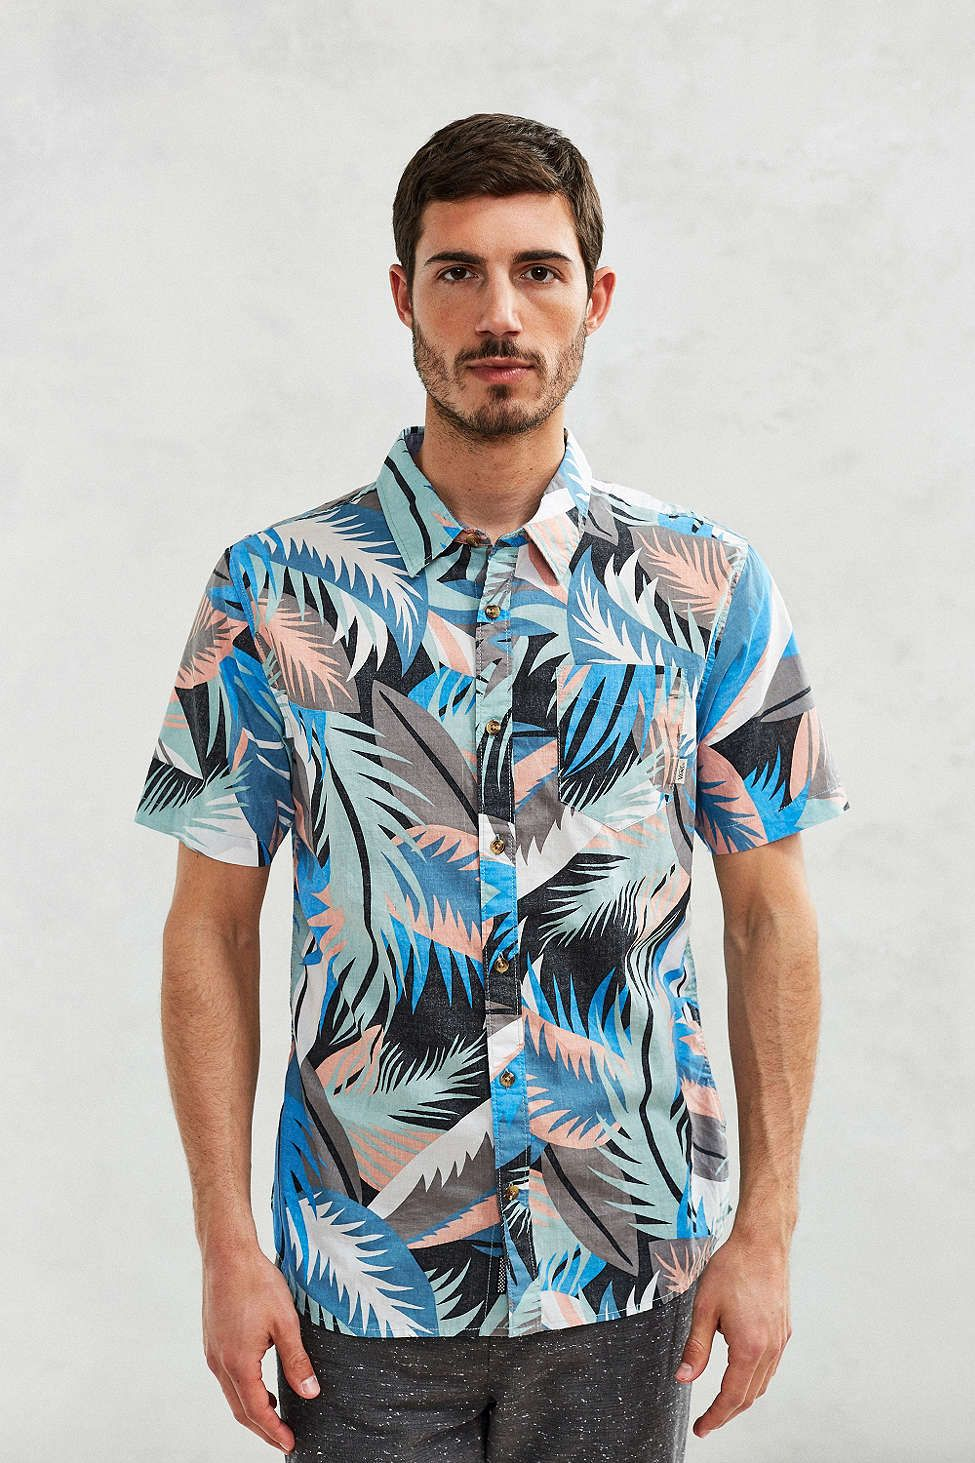 abdee437ed1 Vans Cosgrove Canton Stanton Floral Short-Sleeve Button-Down Shirt - Urban  Outfitters